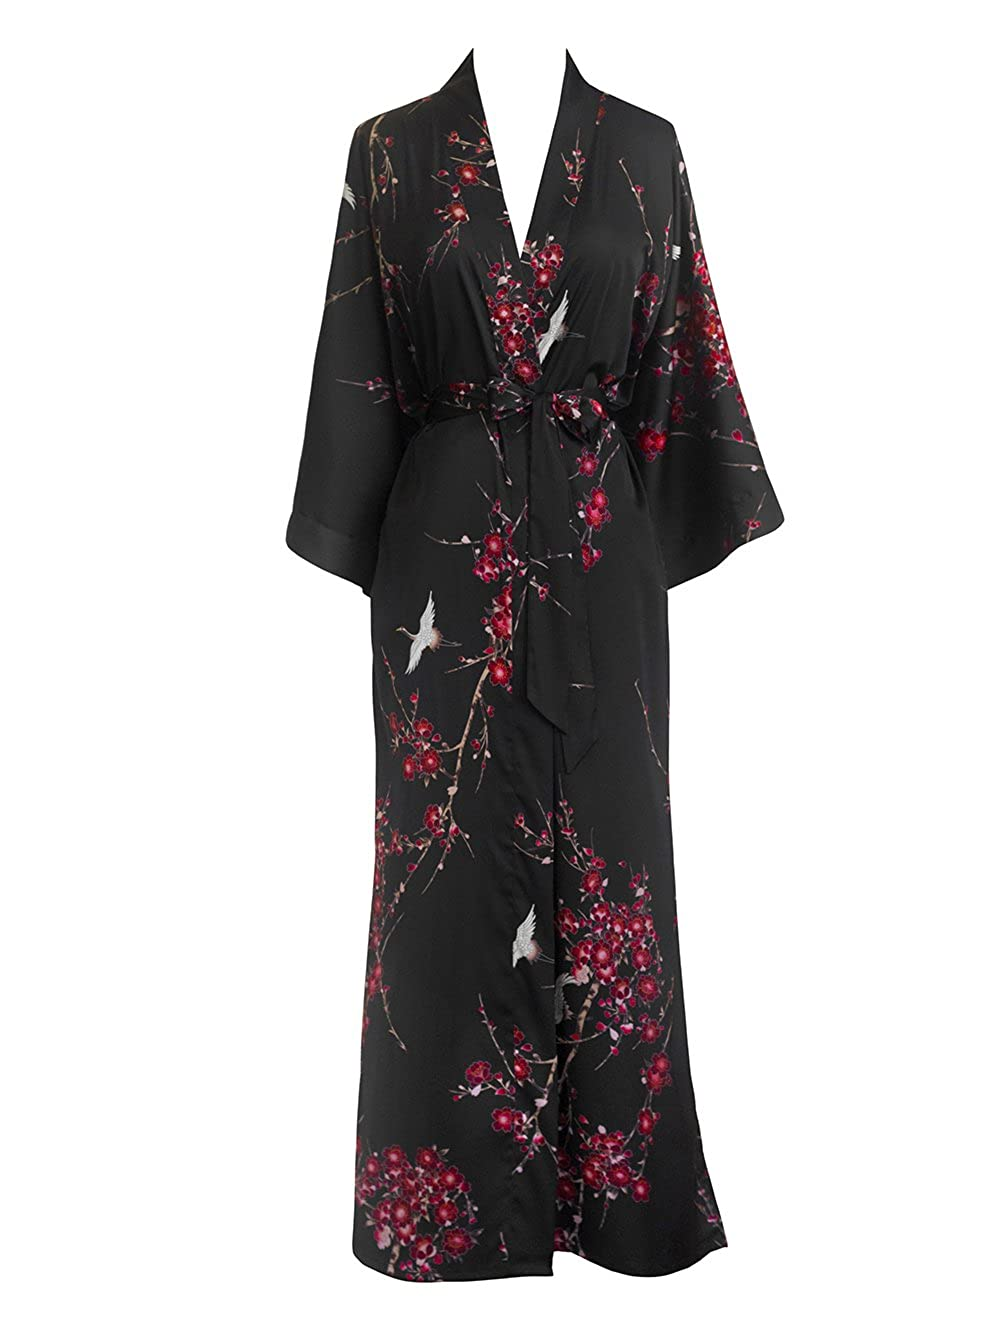 Cherry Blossom & Crane Black Old Shanghai Women's Kimono Robe Long  Watercolor Floral